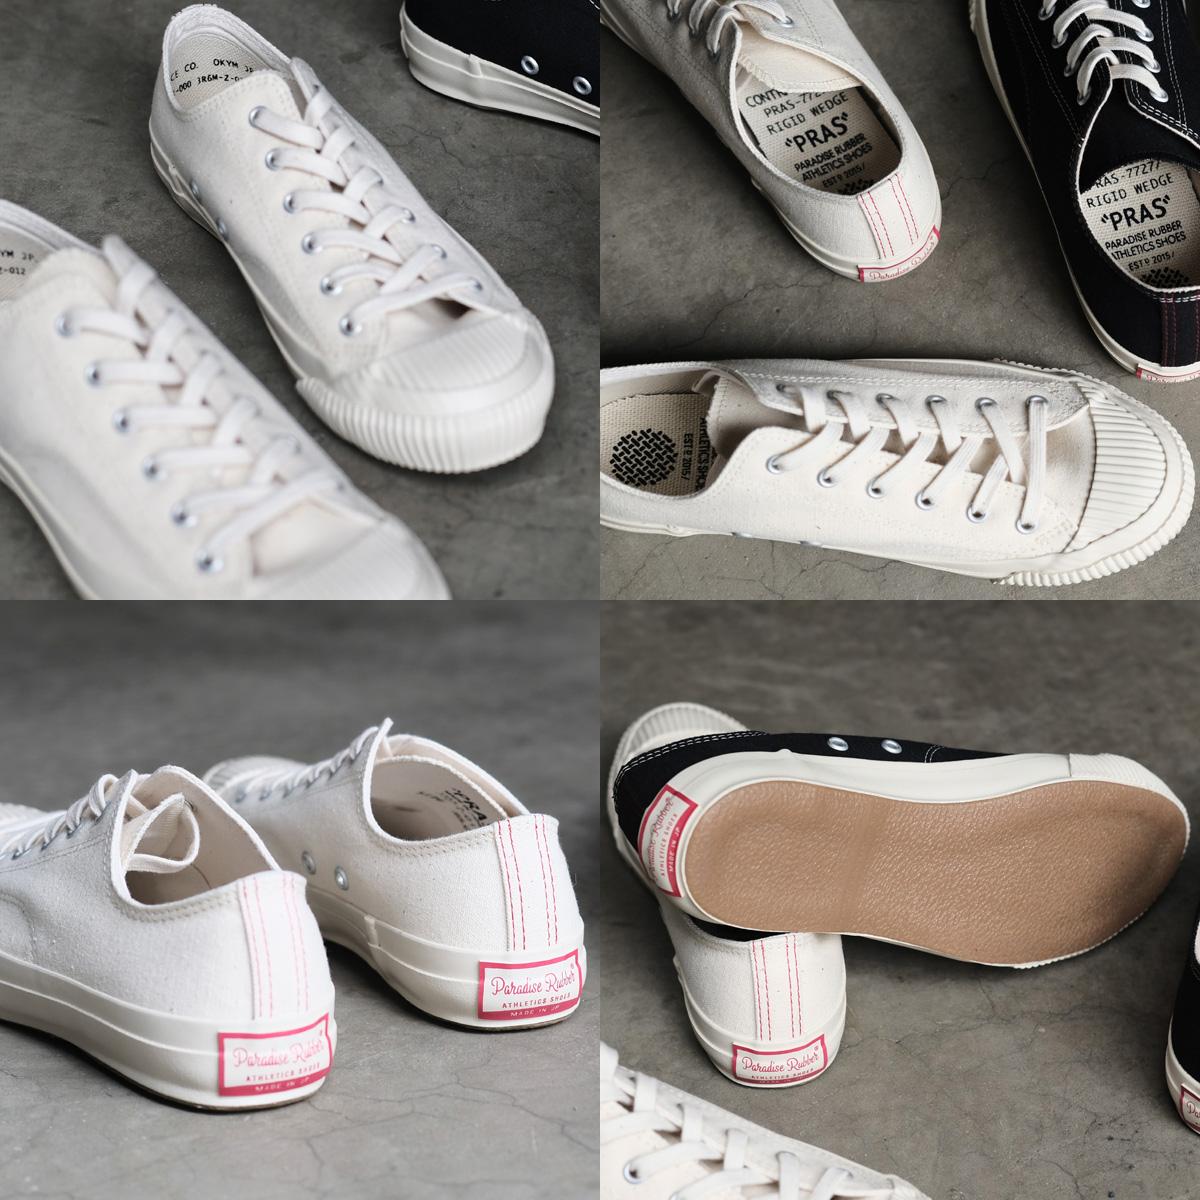 PRAS(加)儿岛帆布外壳盖子Low Cut运动鞋(Kinari/Off White)